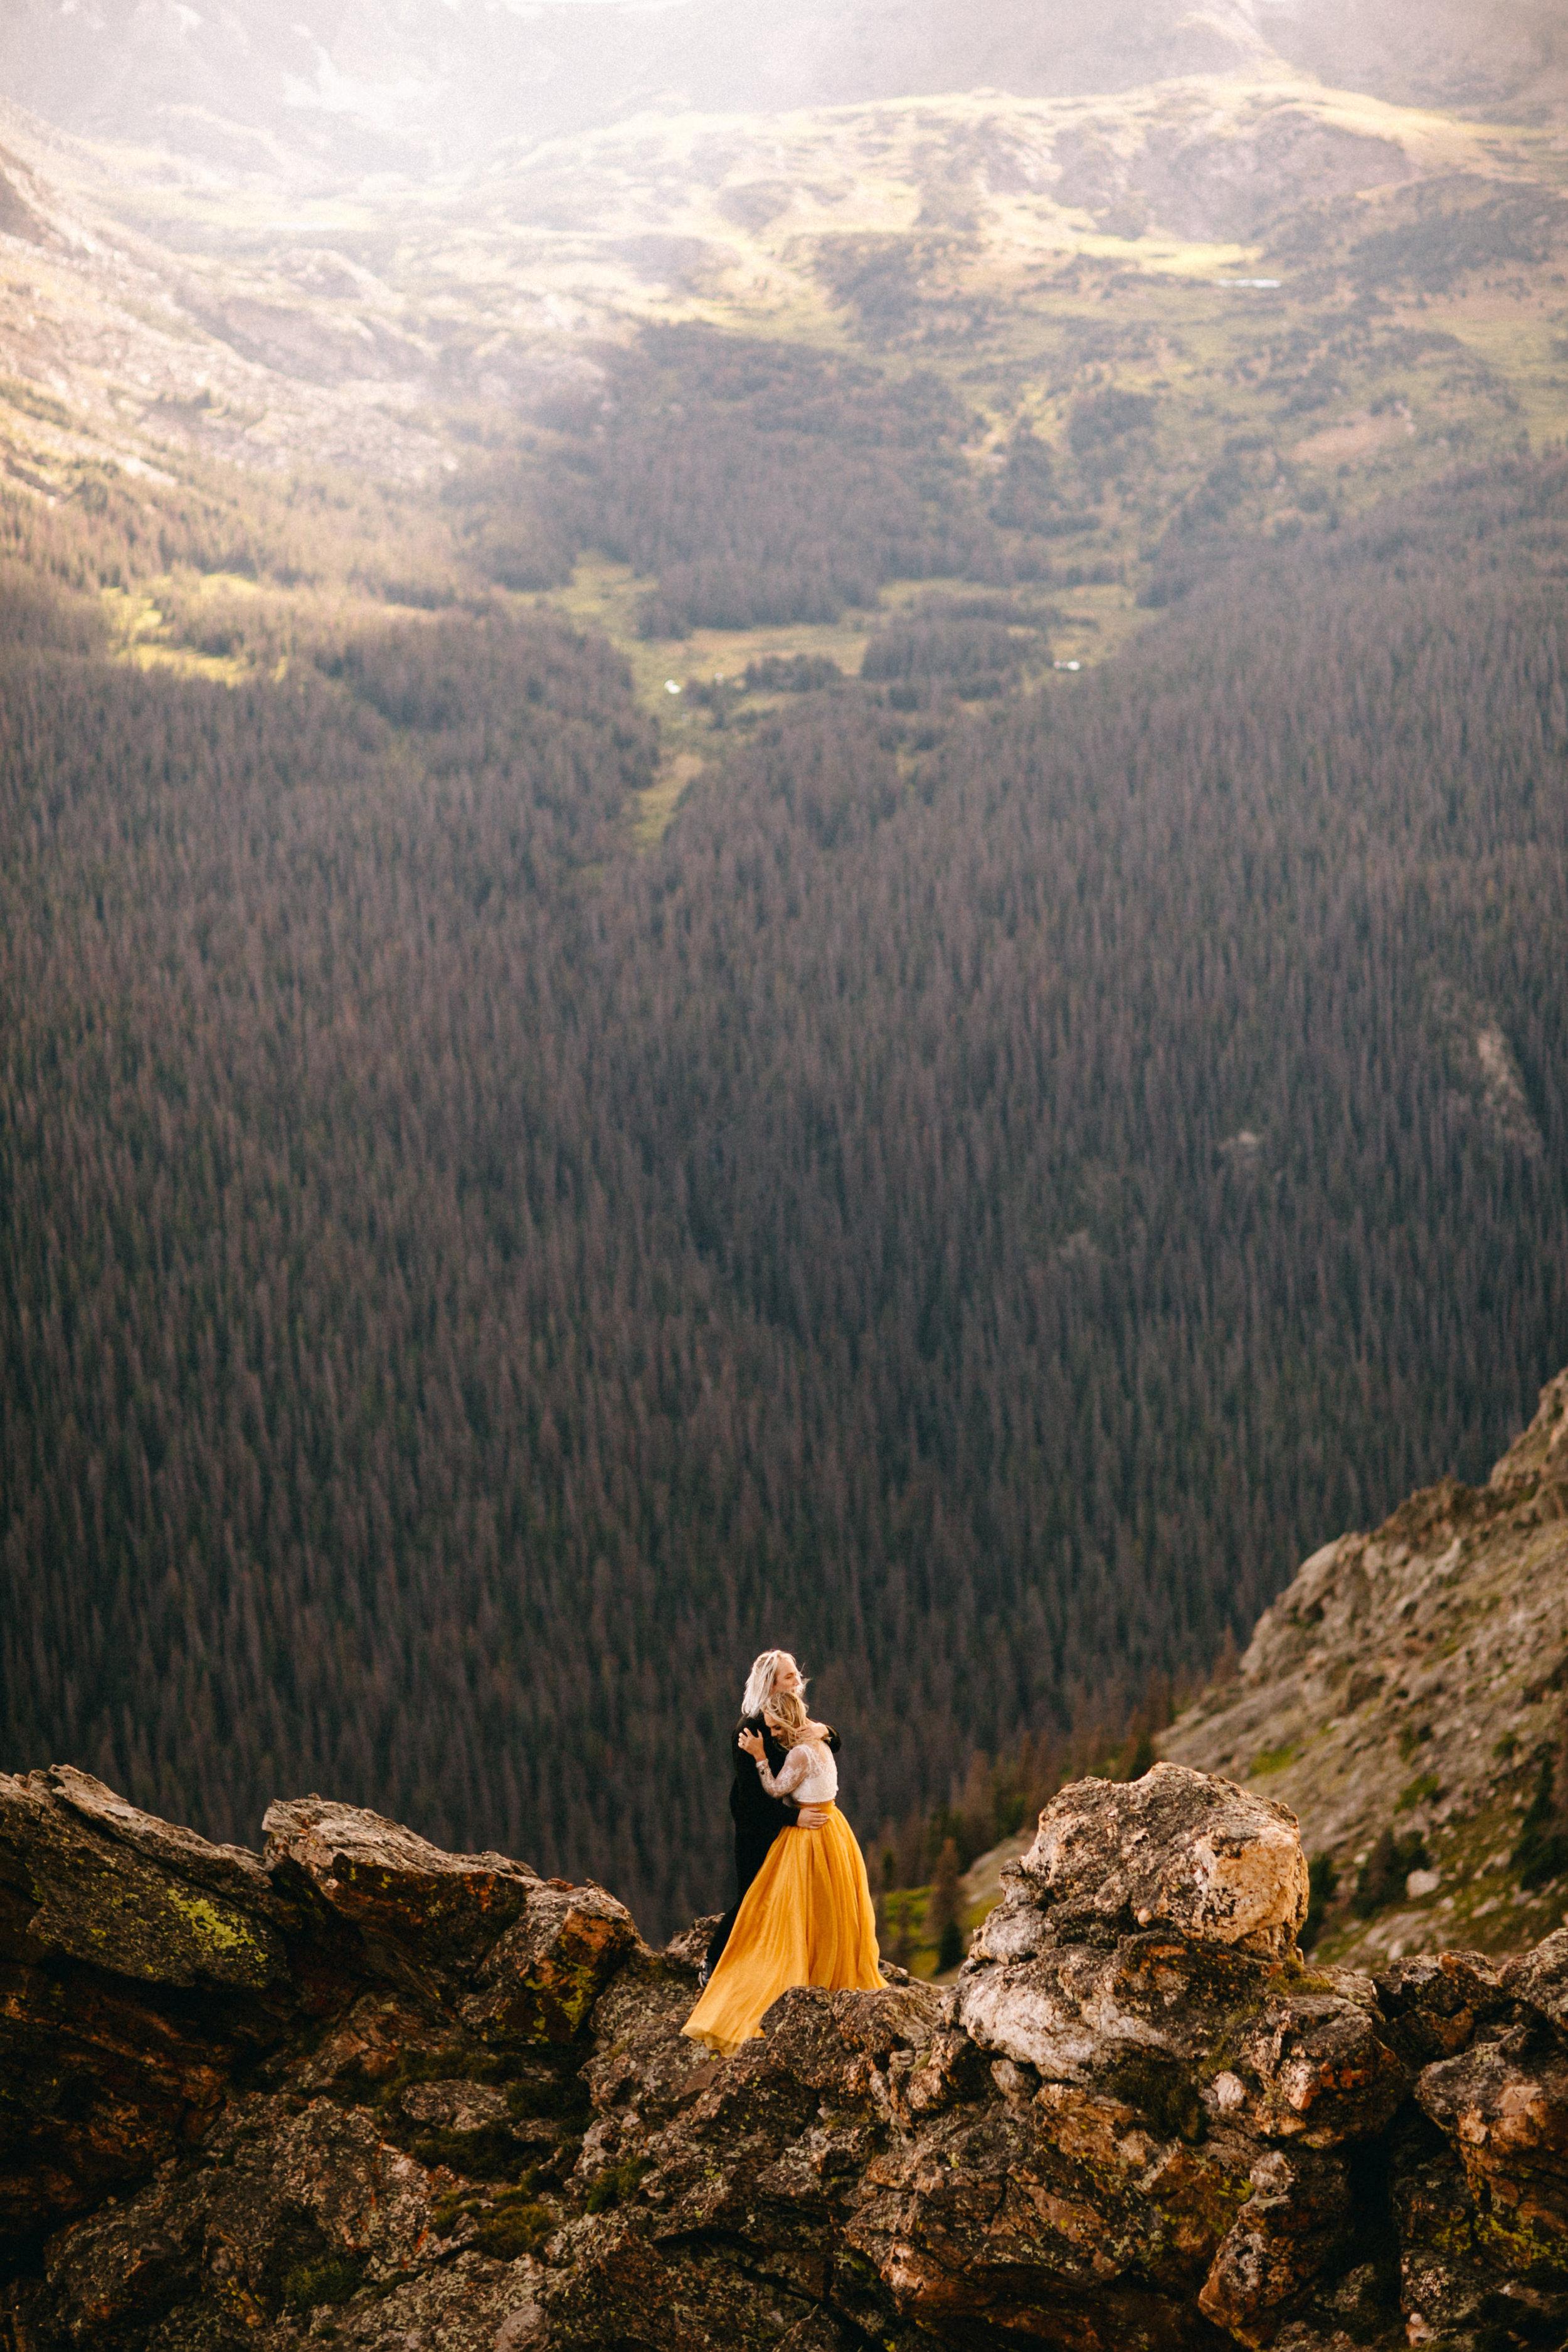 Liz Osban Photography Rocky Mountain National Park Trail Ridge Road Sweet Carolina Styles Skirt Marigold Yellow Cole Janzen Kelli Mantooth Mountains Colorado Northern Estes Park Alpine Elopement Wedding Destination Adventure LBGT Engaged9.jpg